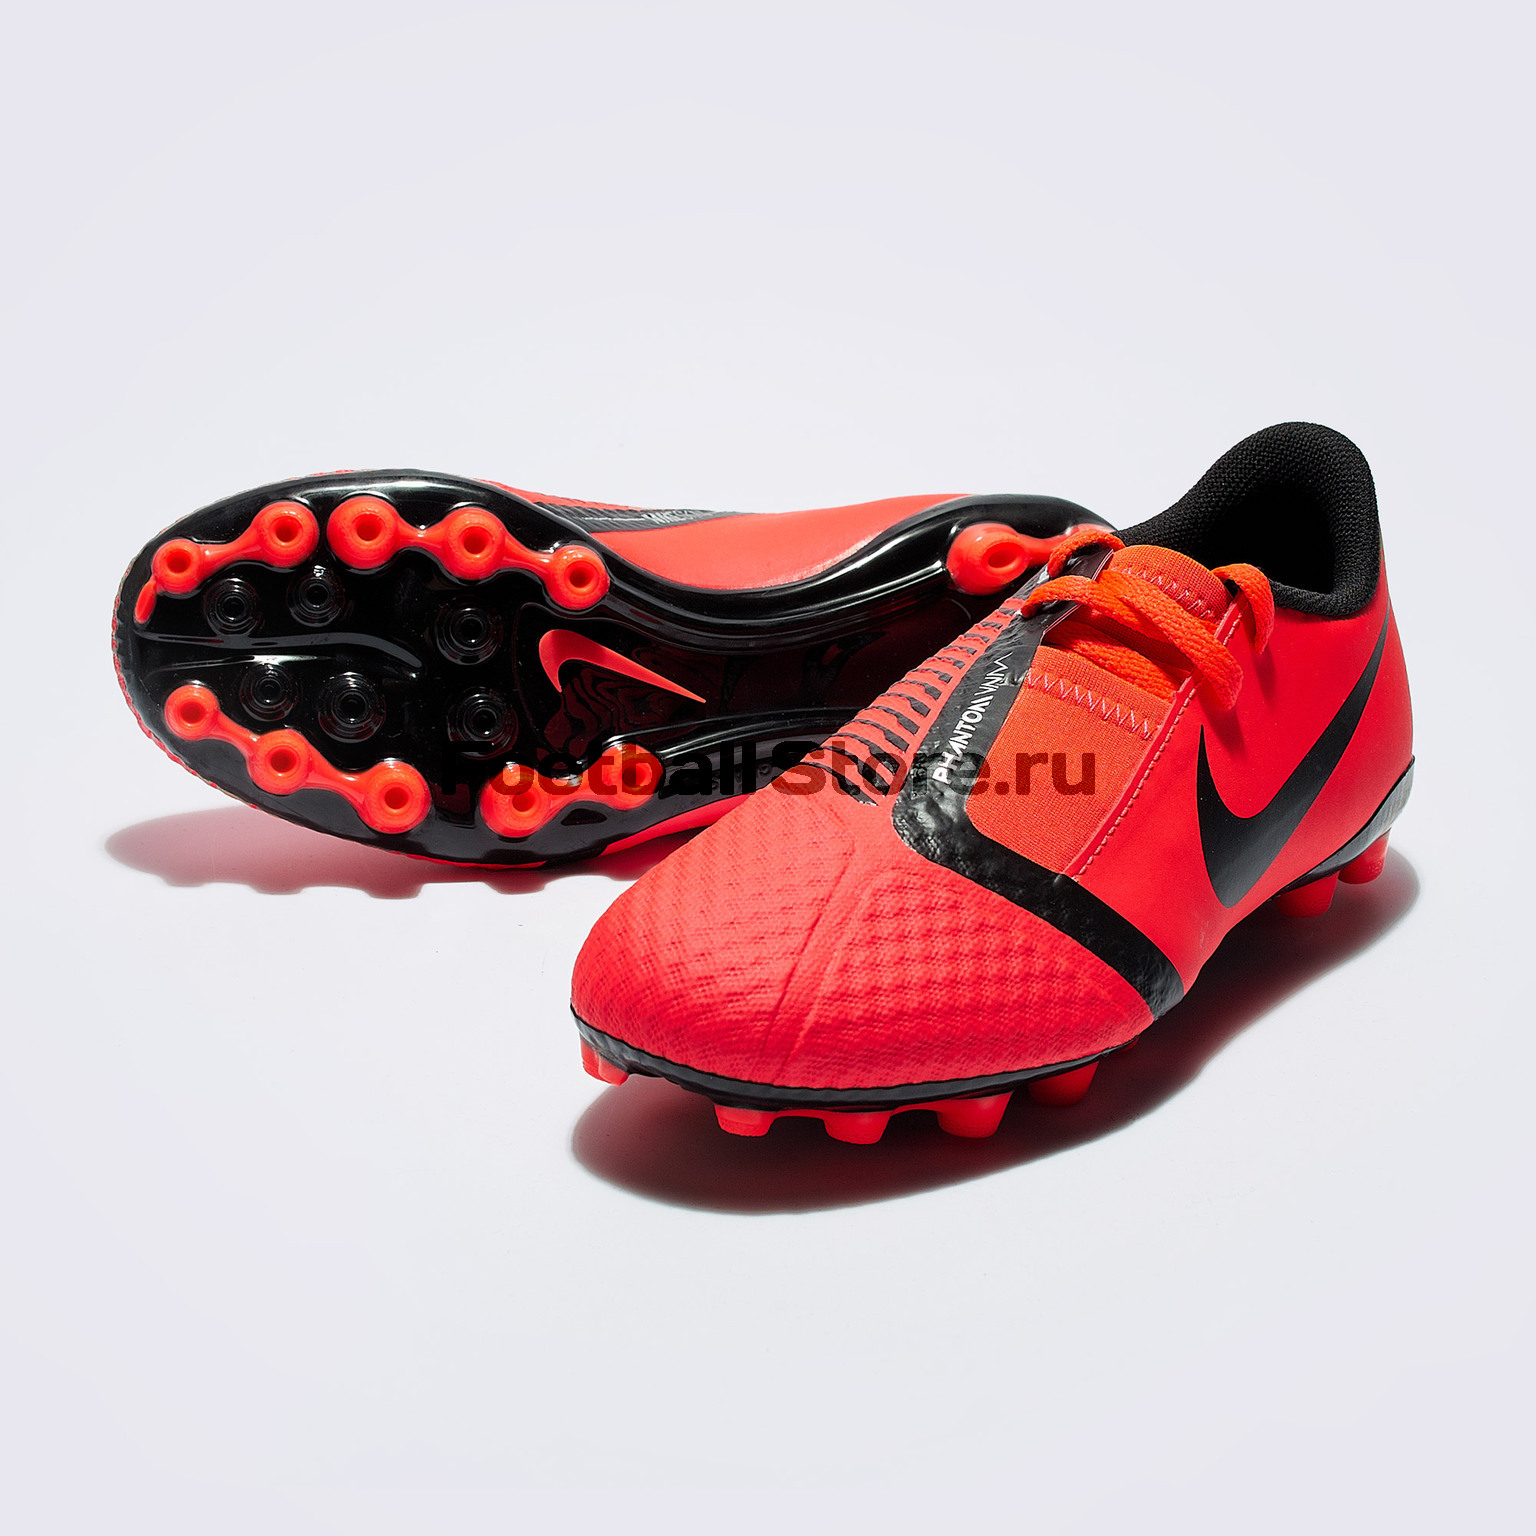 Бутсы детские Nike Phantom Venom Academy AG-R AV3037-600 бутсы детские nike phantom vision academy df sg aq9298 400